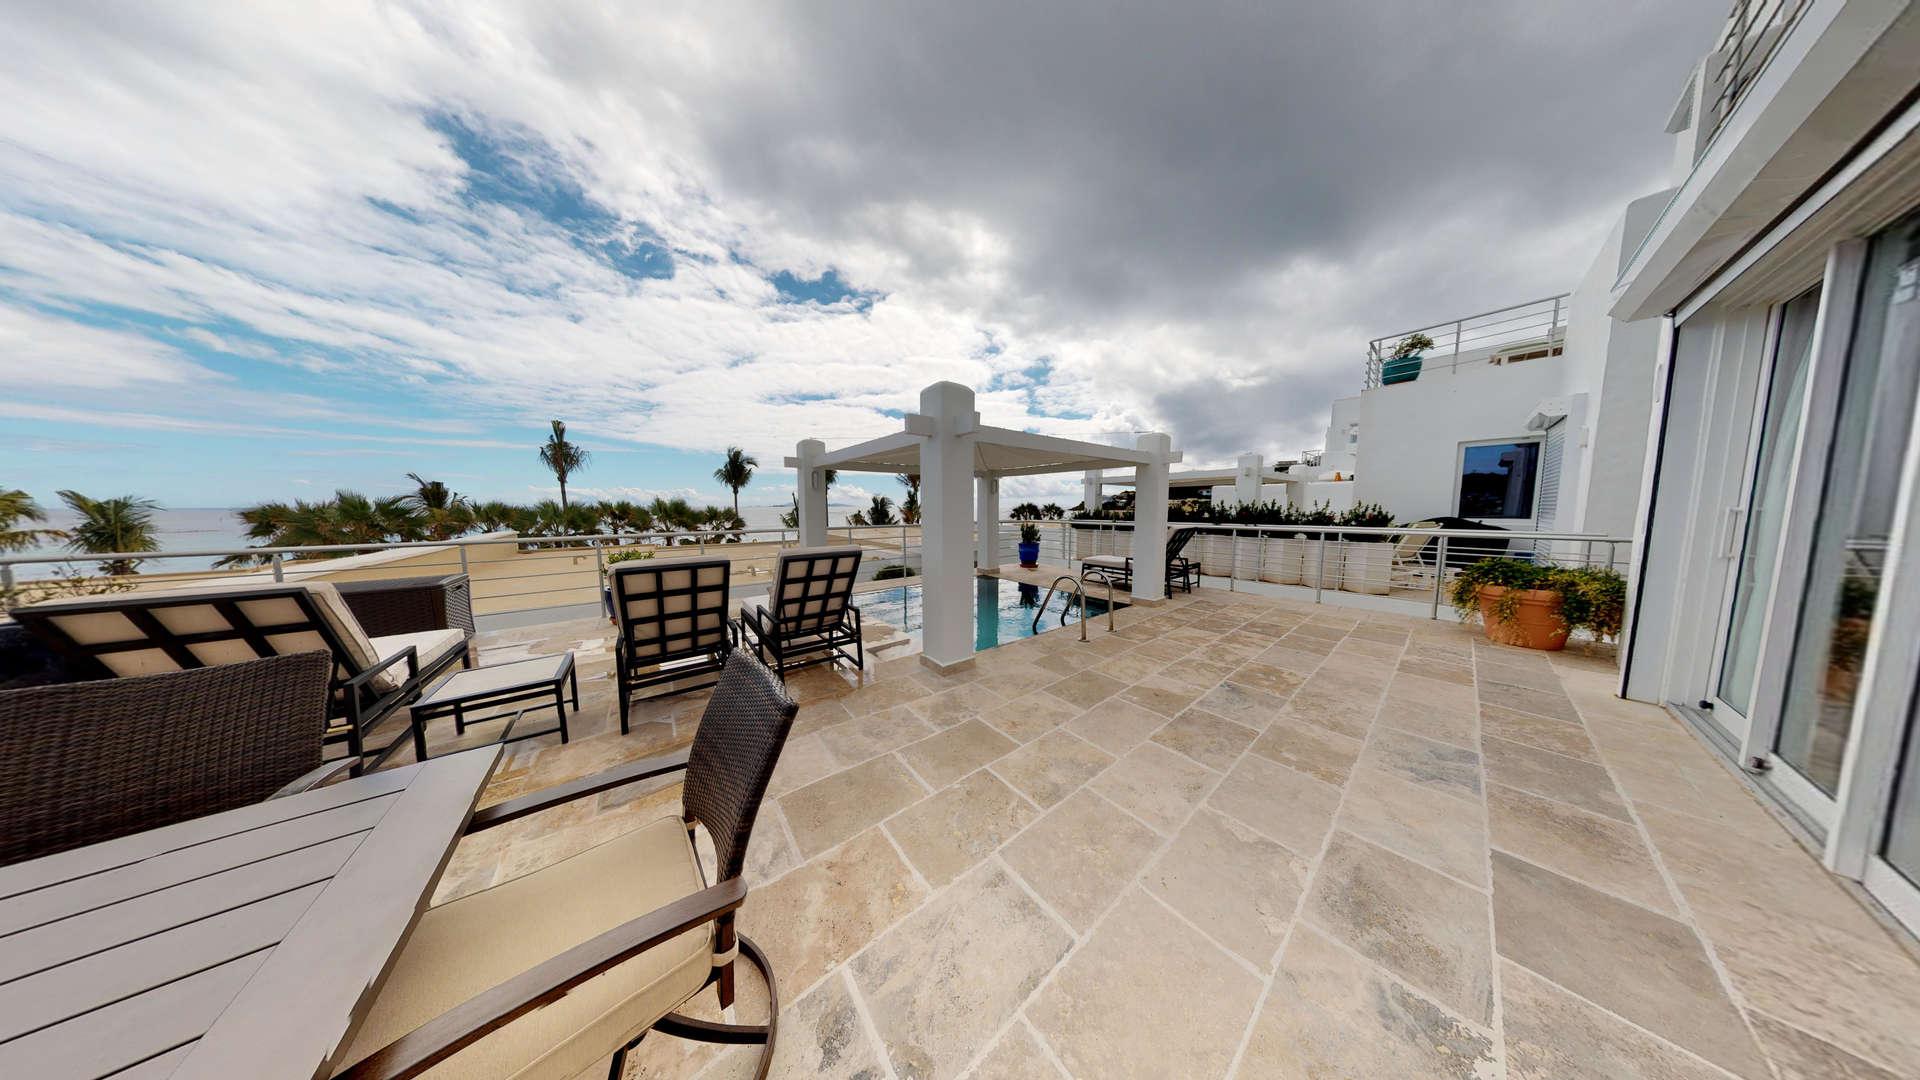 Luxury villa rentals caribbean - St martin - Sint maarten - Coral beach club - Toscana - Image 1/17